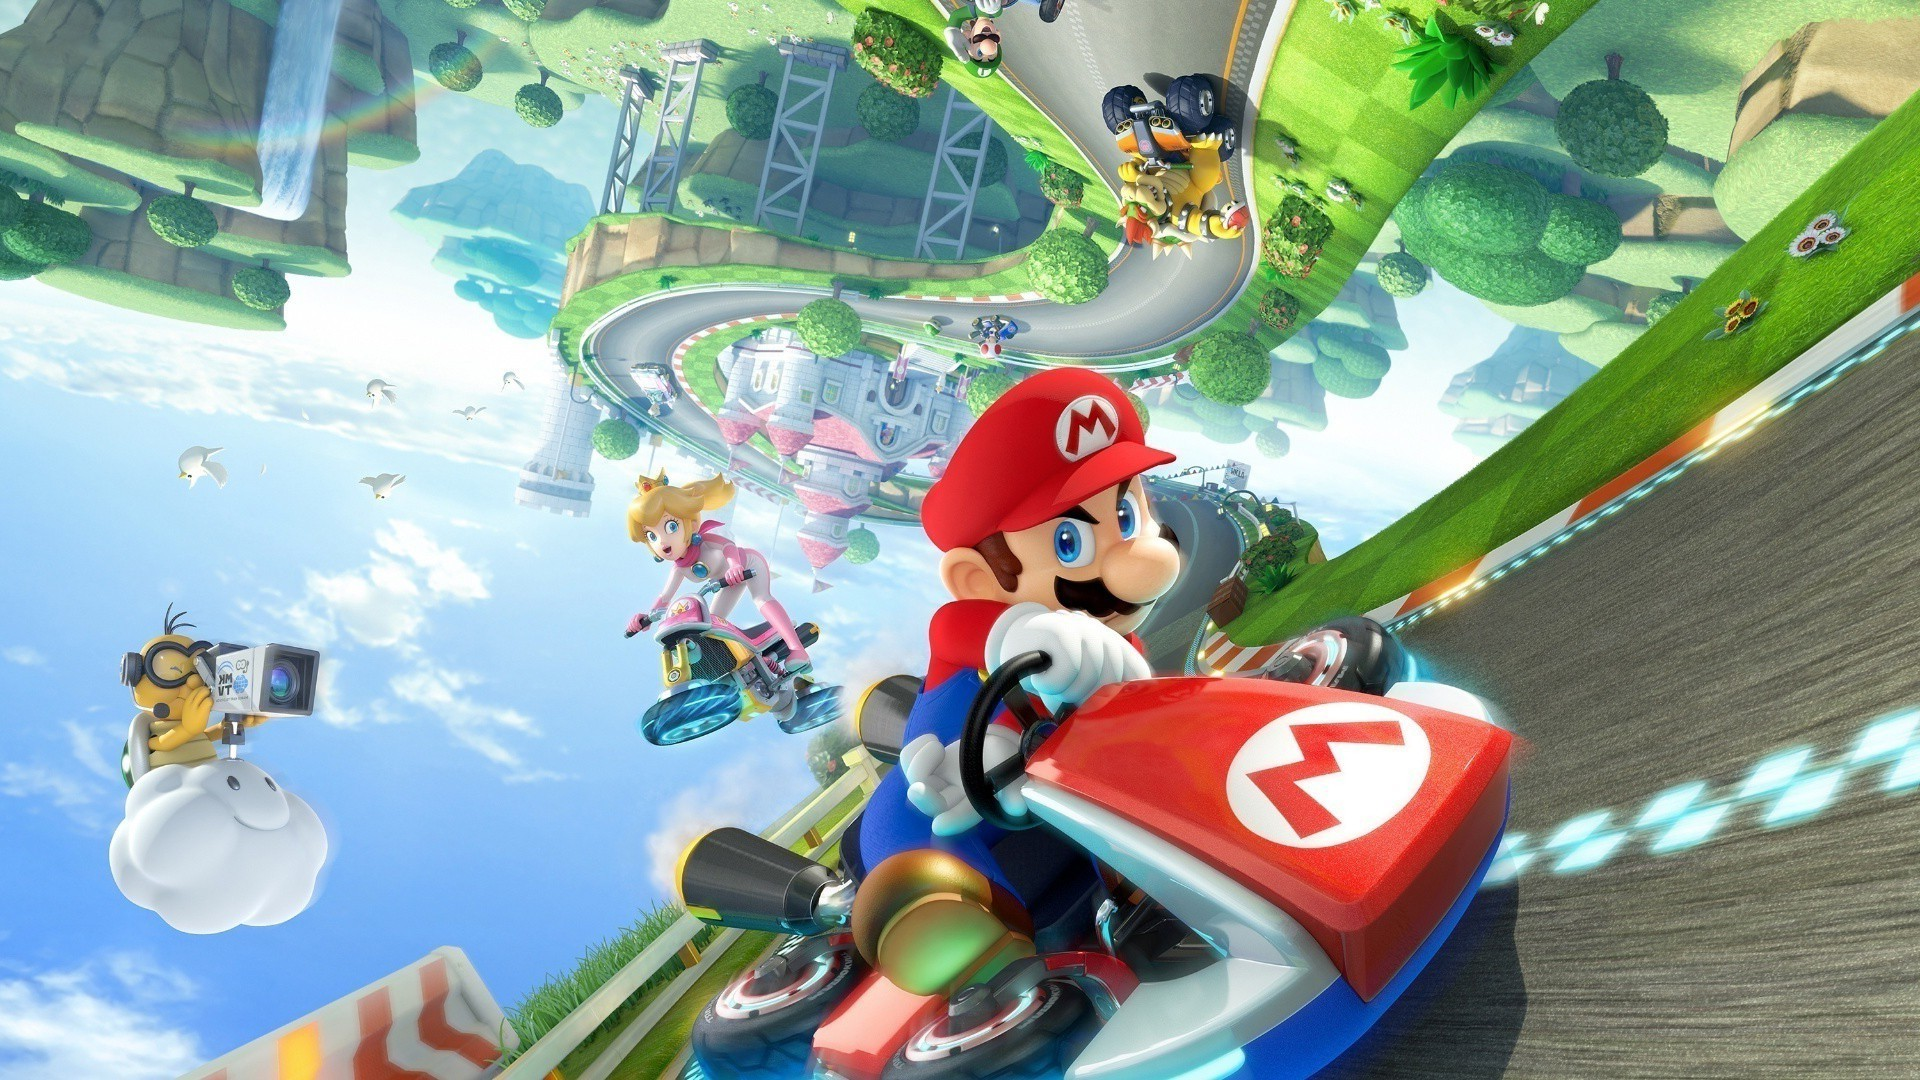 Kart, Super Mario, Princess Peach, Bowser, Mario Kart, Nintendo, Wii U,  Video Games Wallpapers HD / Desktop and Mobile Backgrounds